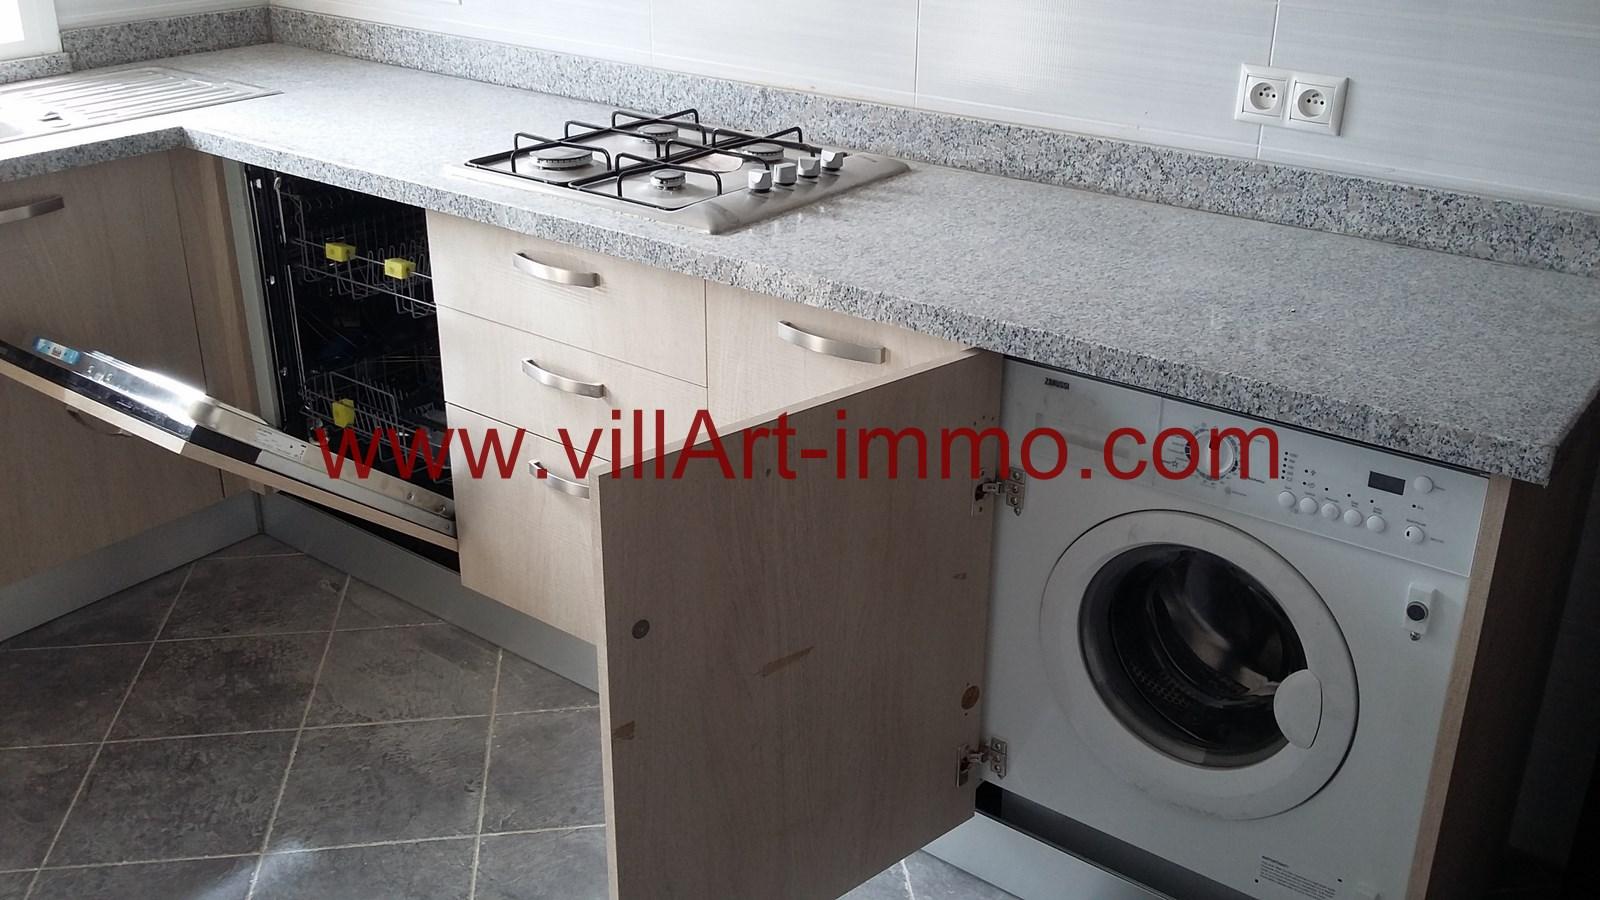 4-location-appartement-non-meuble-tanger-cuisine-2-l880-villart-immo